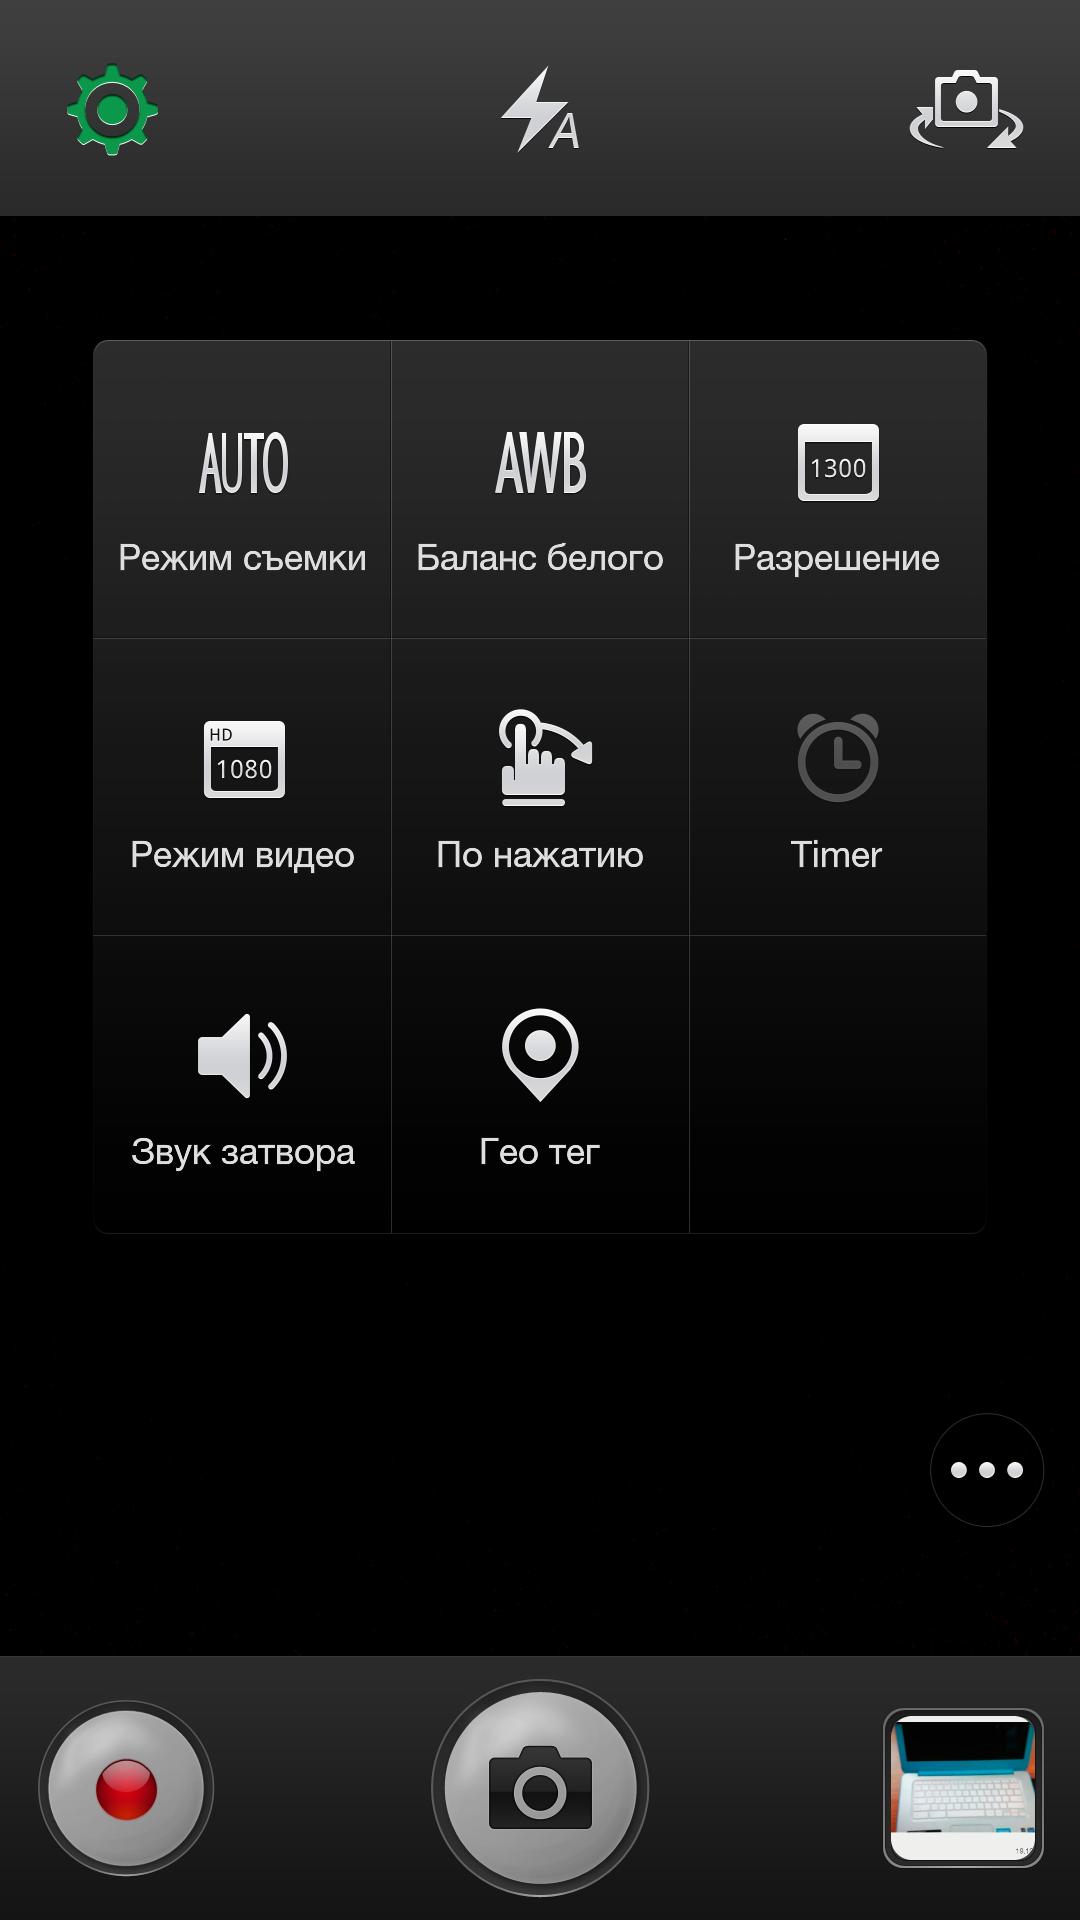 Screenshot_2013-10-26-19-35-53